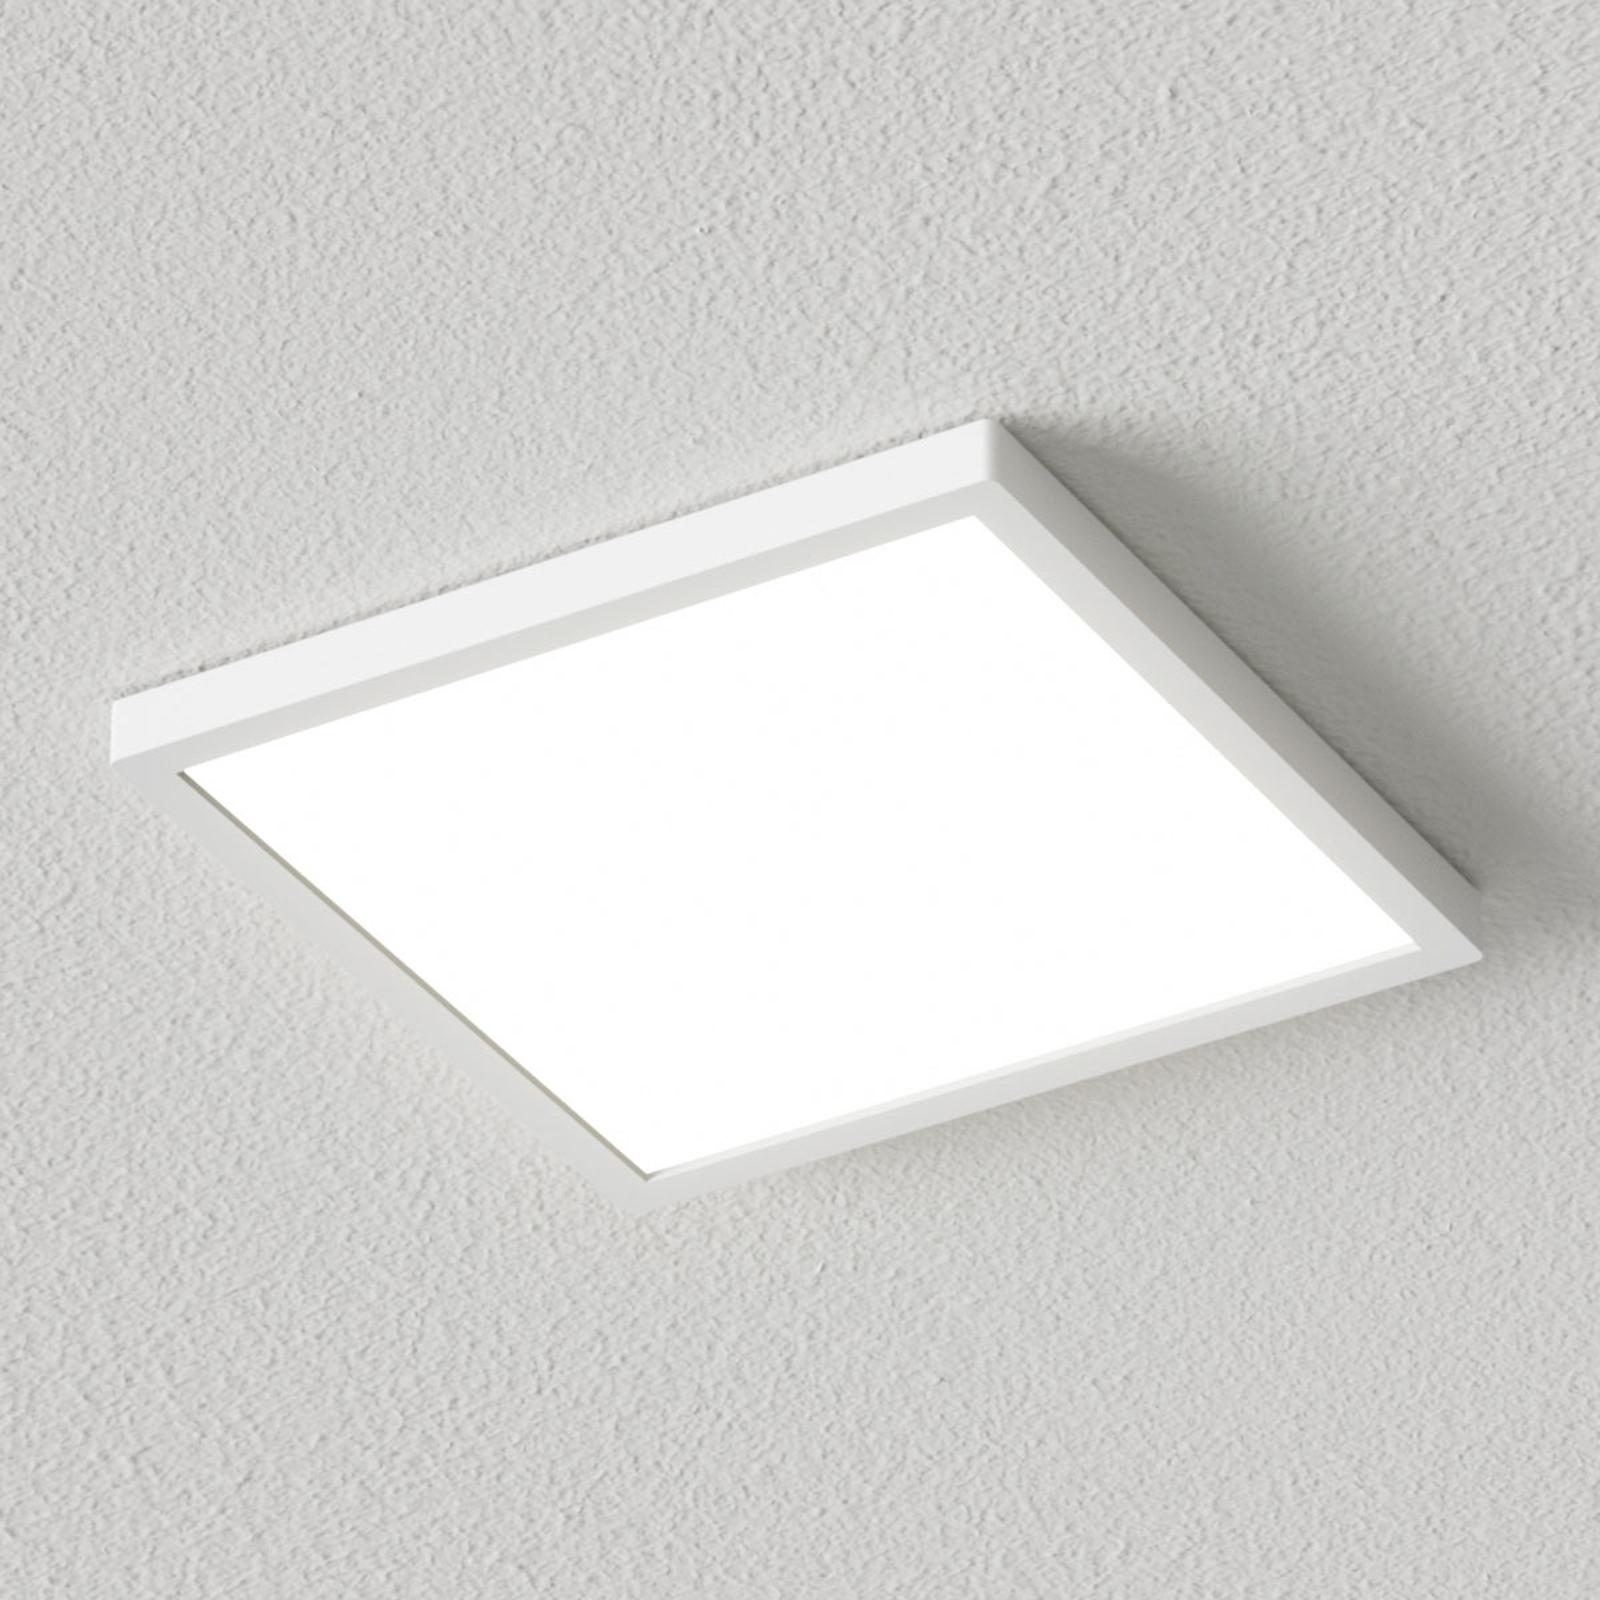 Biała, kanciasta lampa sufitowa LED Solvie